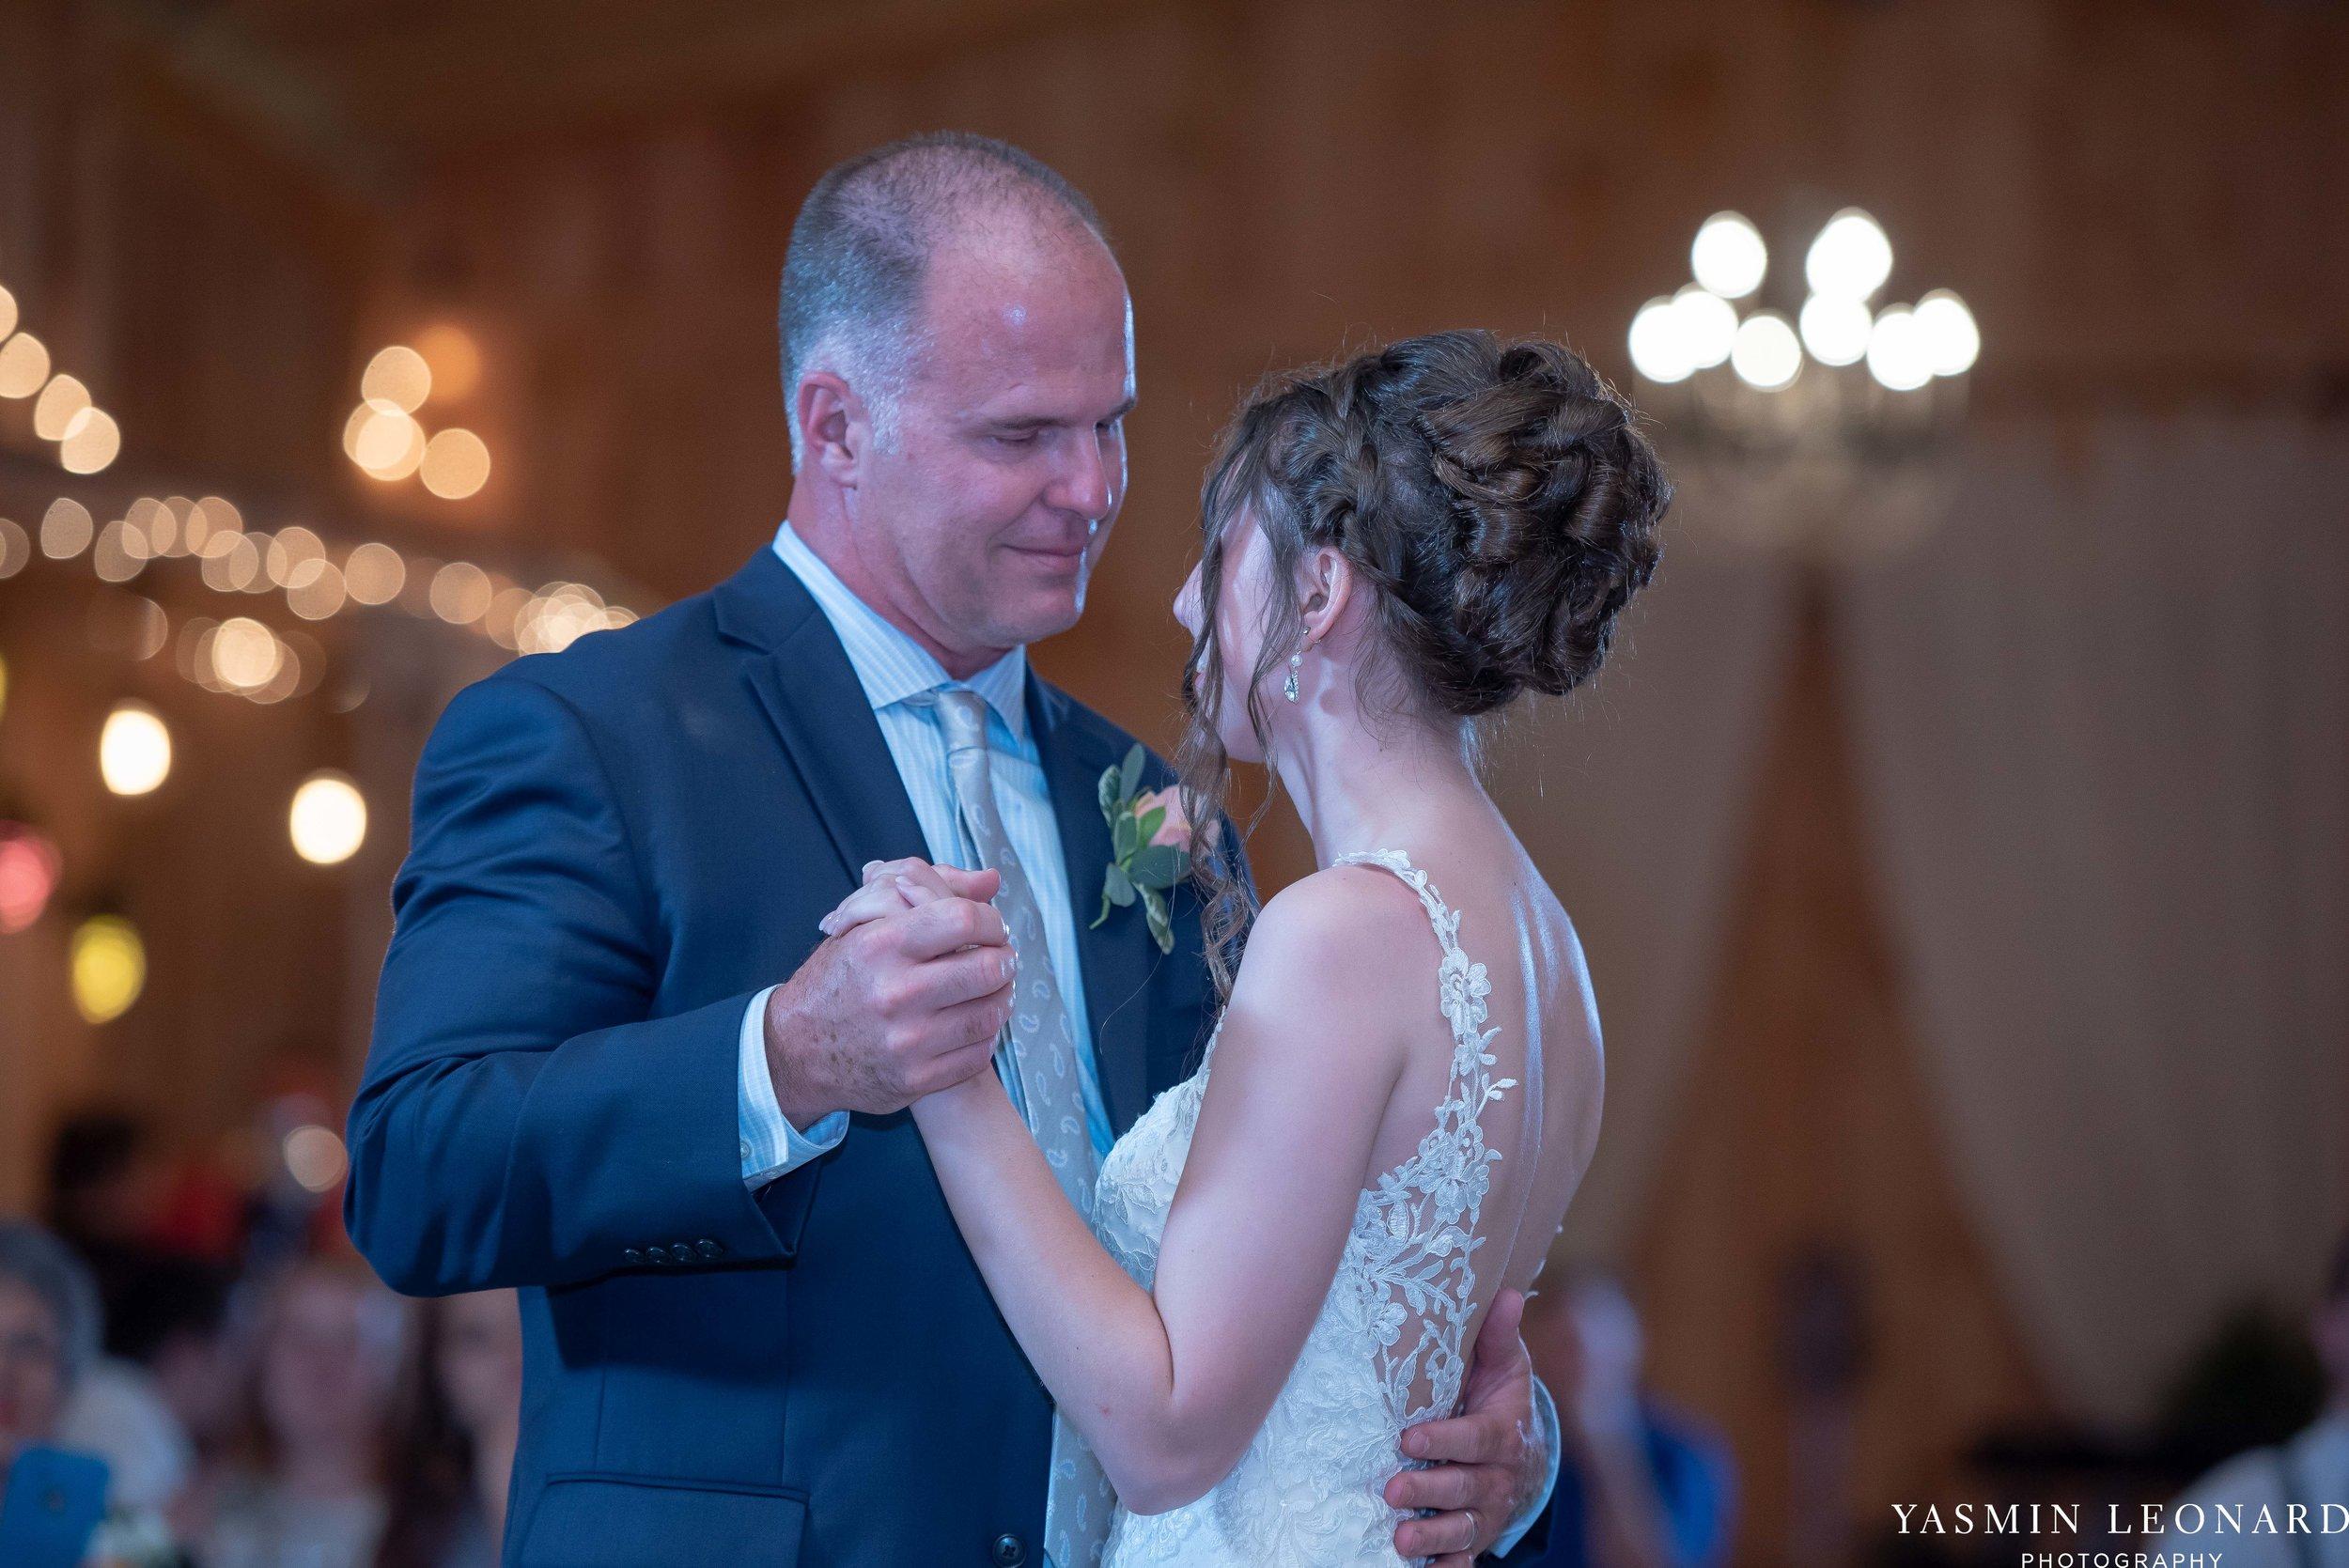 Old Homeplace Vineyard - NC Weddings - Outdoor Summer Weddings - Peony Boutique - Vineyard Wedding - NC Photographer - Yasmin Leonard Photography-71.jpg